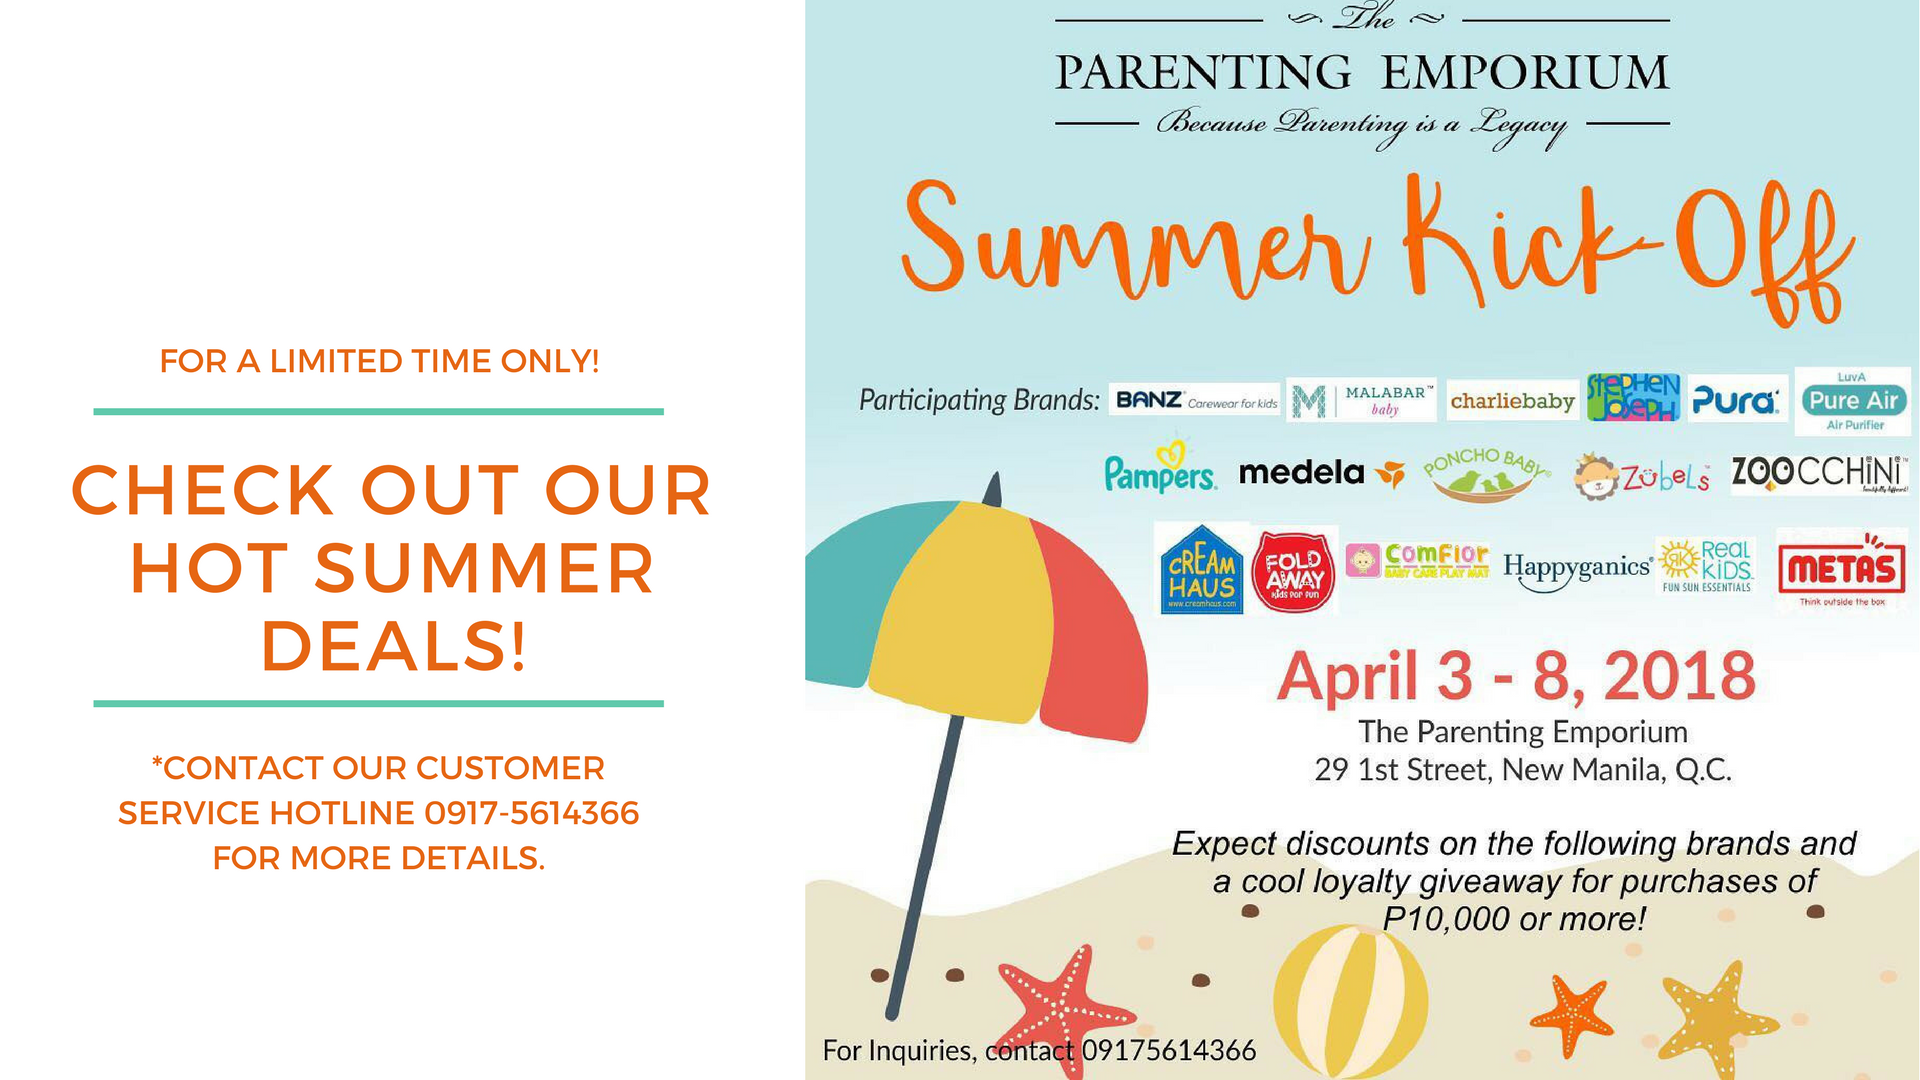 2c4899daeae68 Catch the Summer Kick-Off Sale at The Parenting Emporium! - The ...